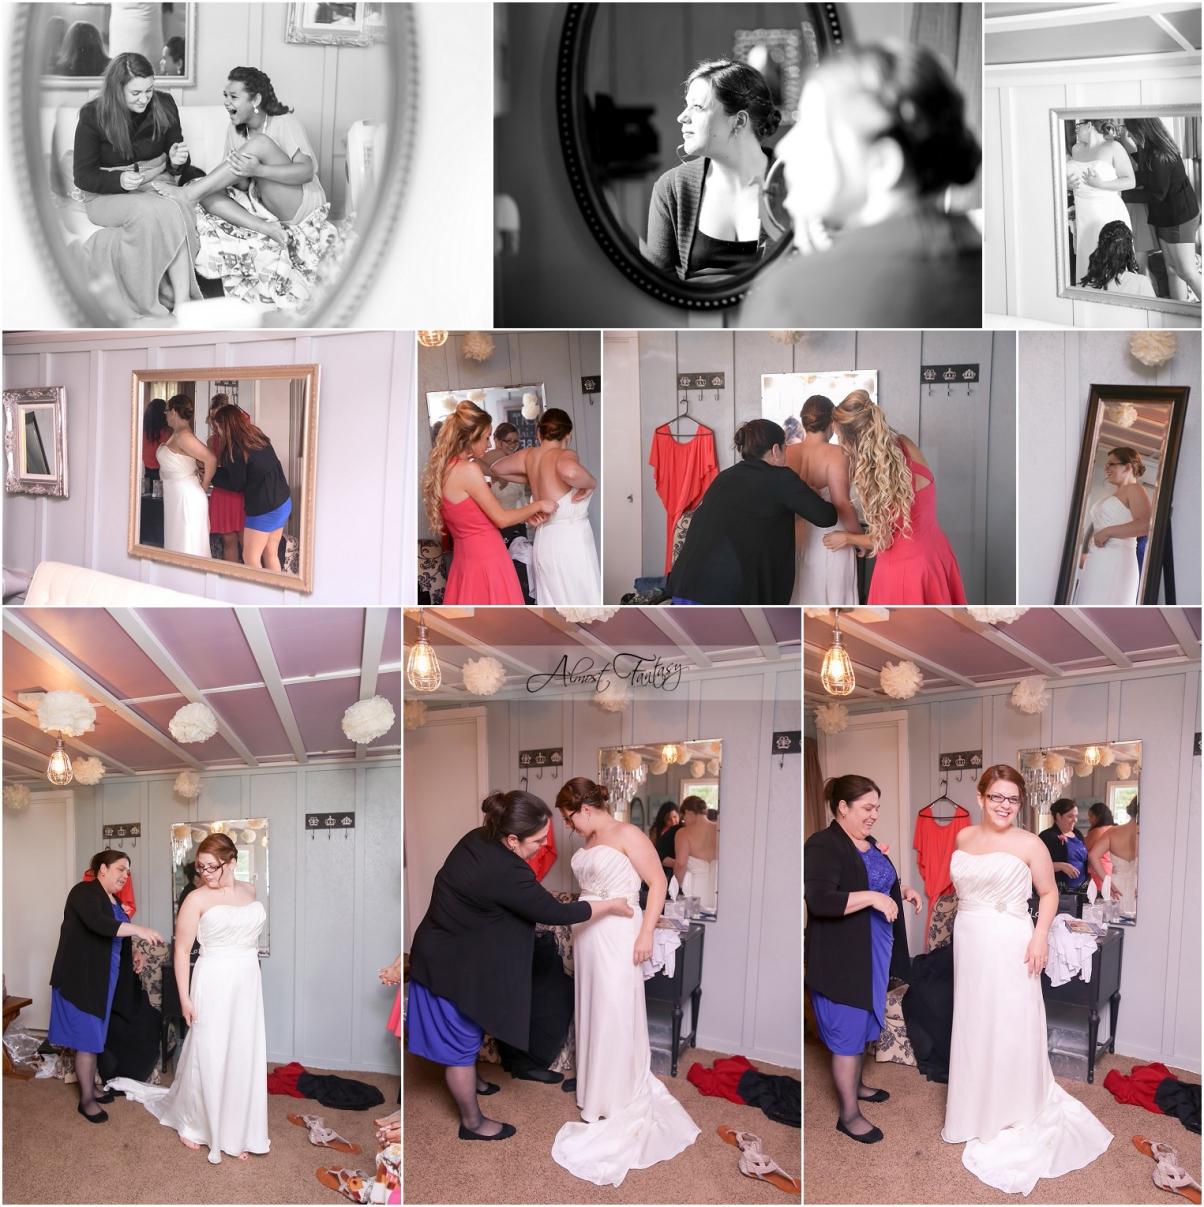 Hydrangea-Blu-Barn-Rockford-Mi-Wedding-Photographer_0003(pp_w1204_h1207)